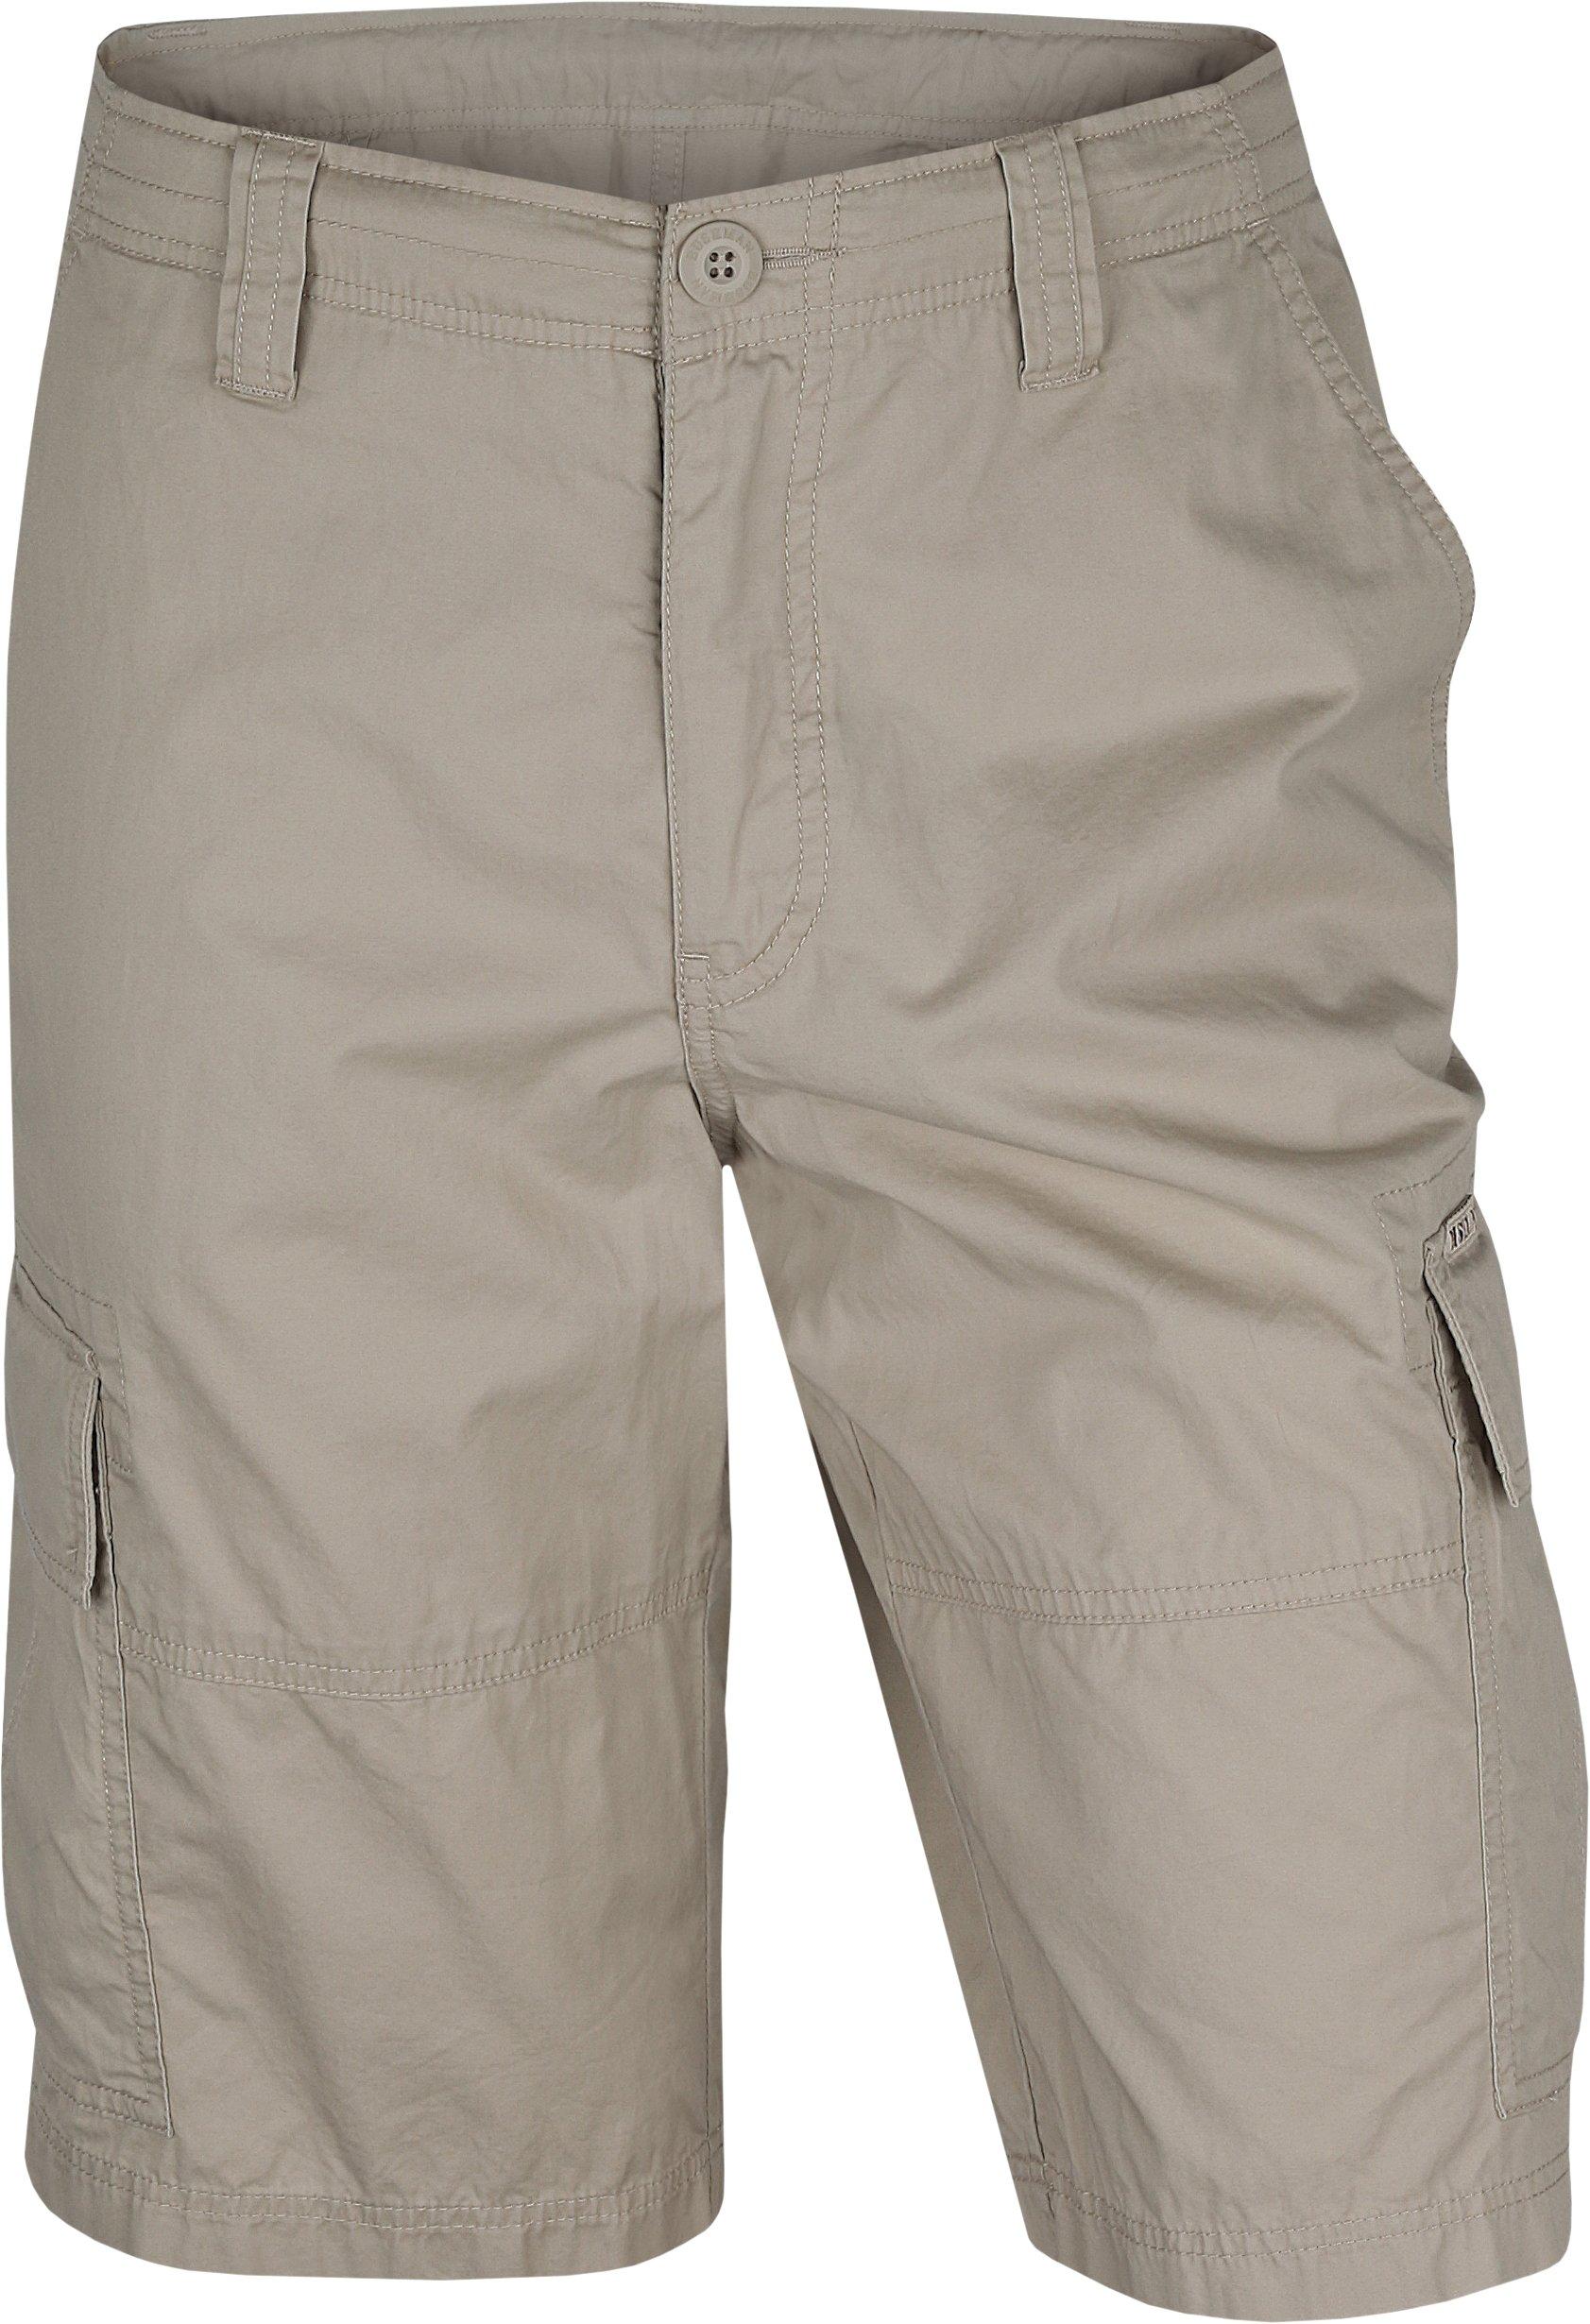 Bushman Outfitters Men's Teron Shorts, Beige, US